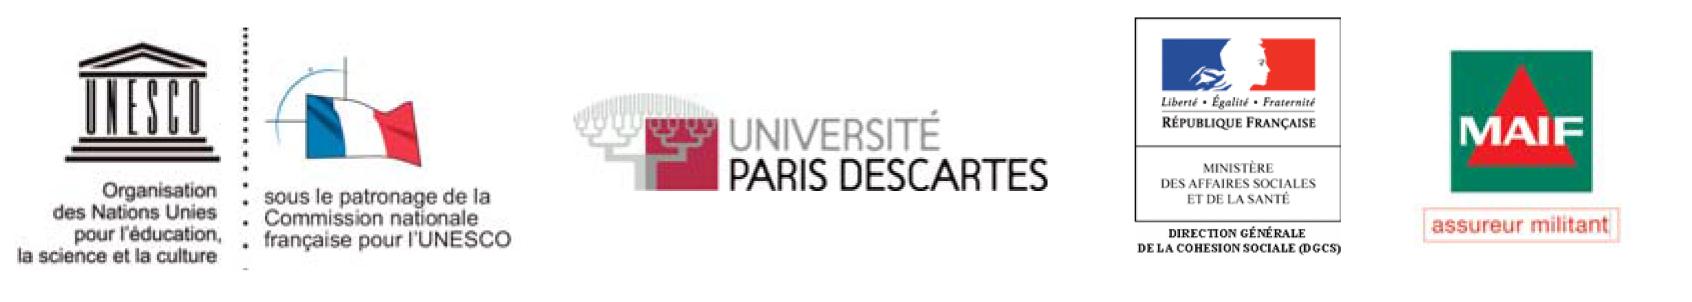 PARIS 2017 PARTENAIRES